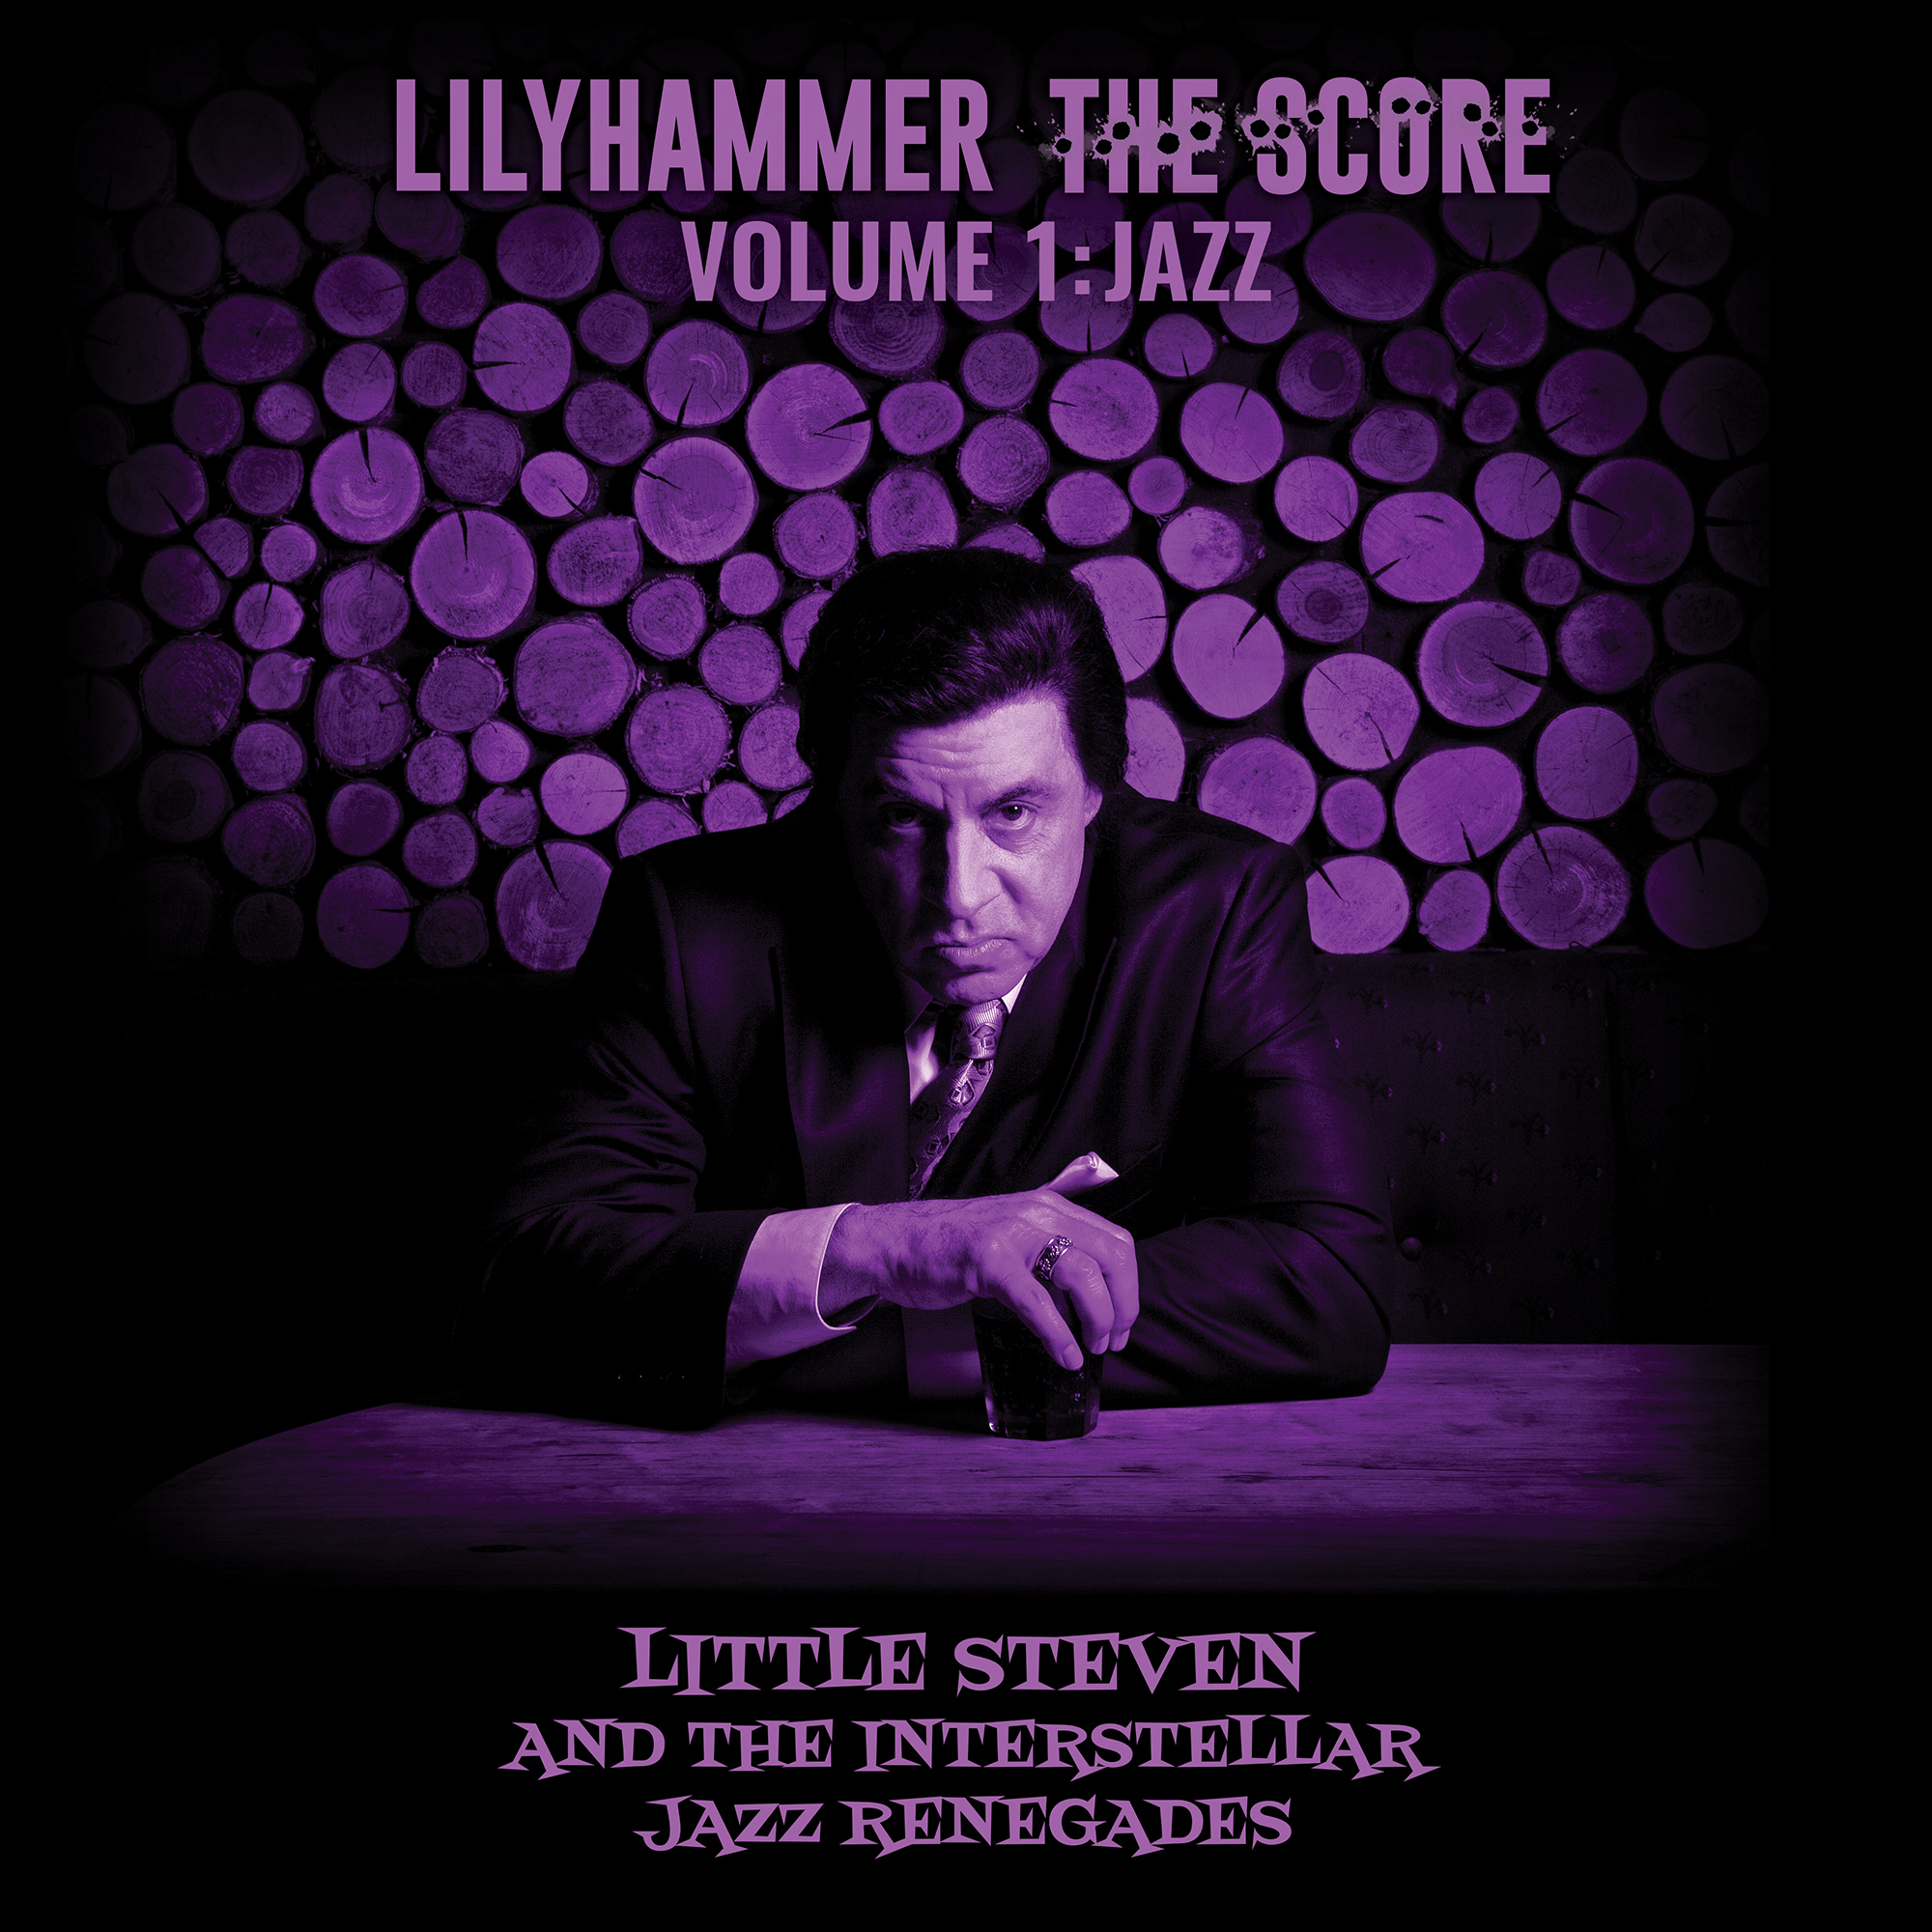 LilyhammerCover.jpg